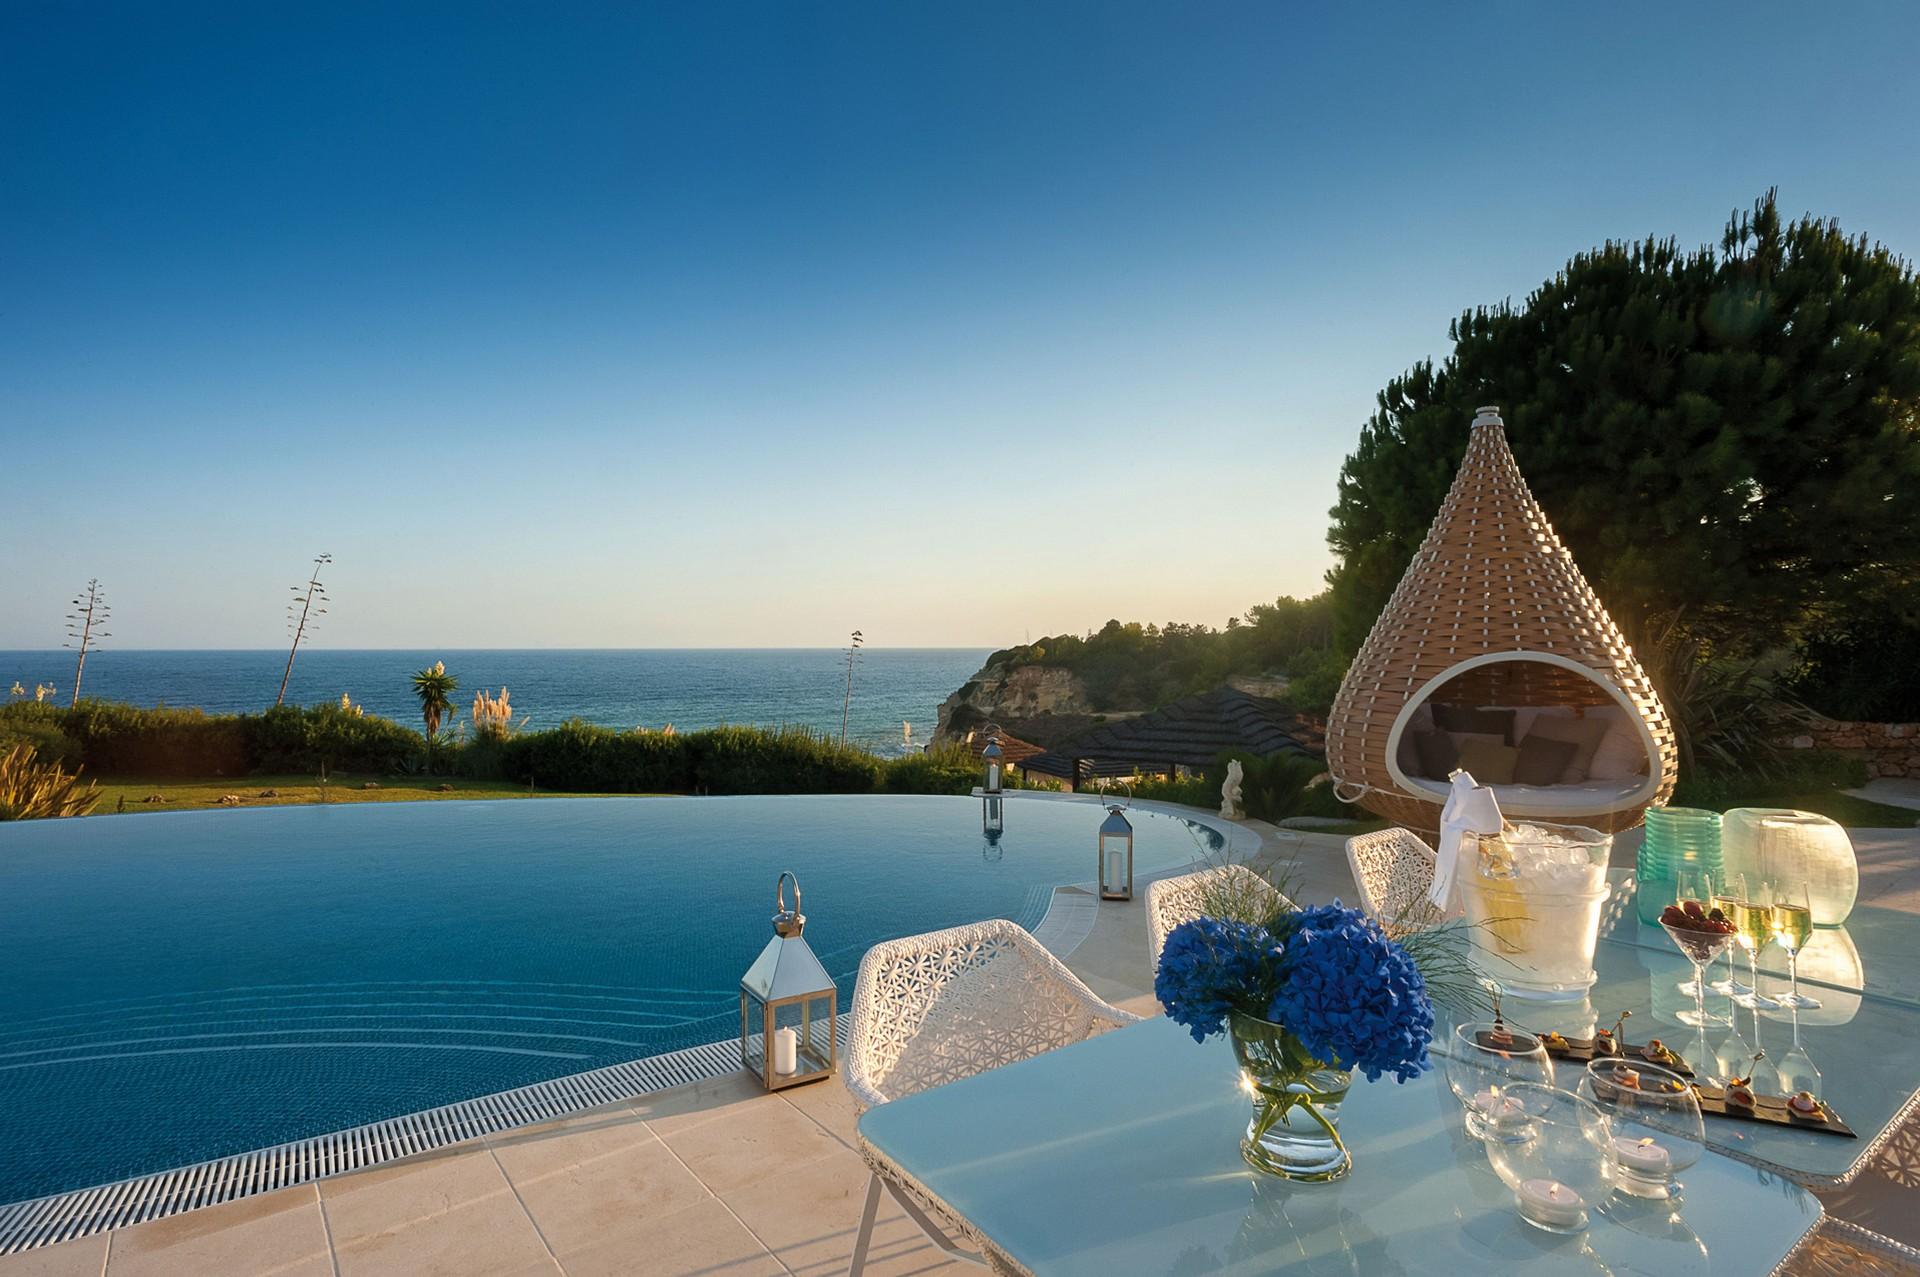 Vila Vita Parc 7 vila vita parc Vila Vita Parc: Get a behind the scenes look of a luxury hotel Vila Vita Parc 7